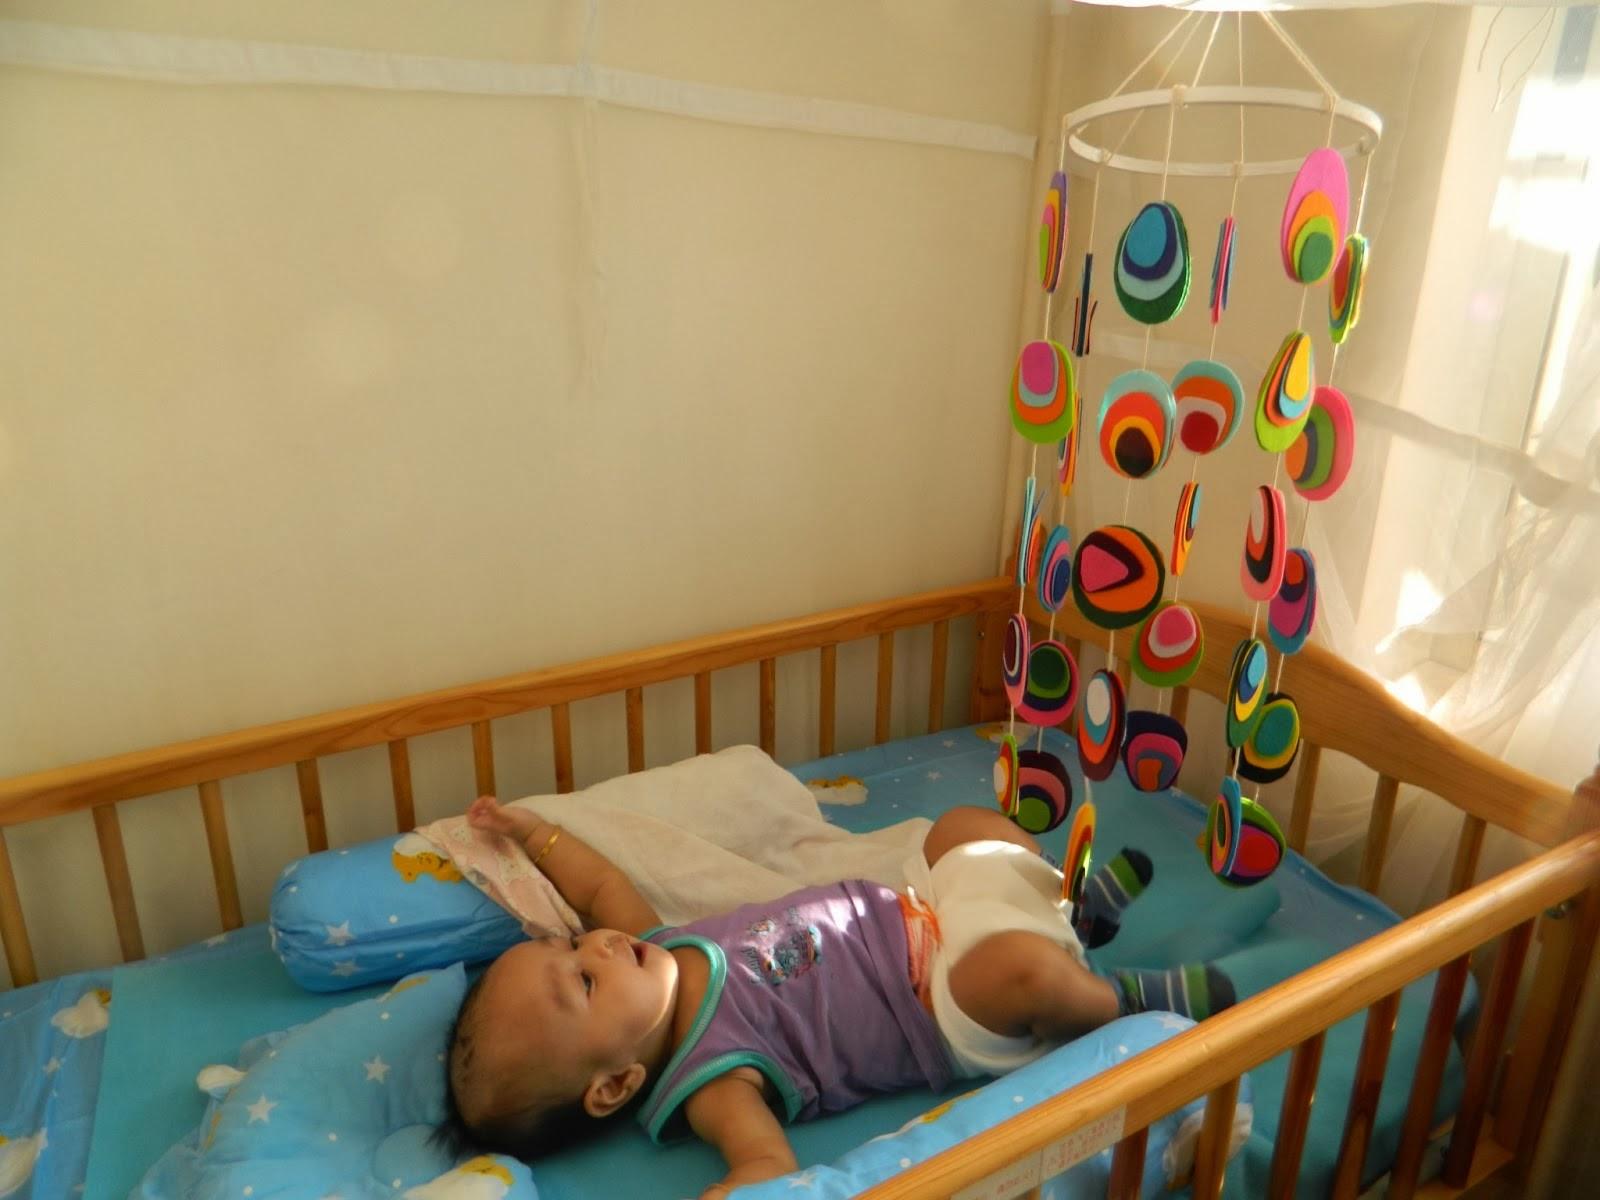 in toys rattles for crib wood bell set of from diy baby holder mobile cribs item wooden natural frame mobiles hanger